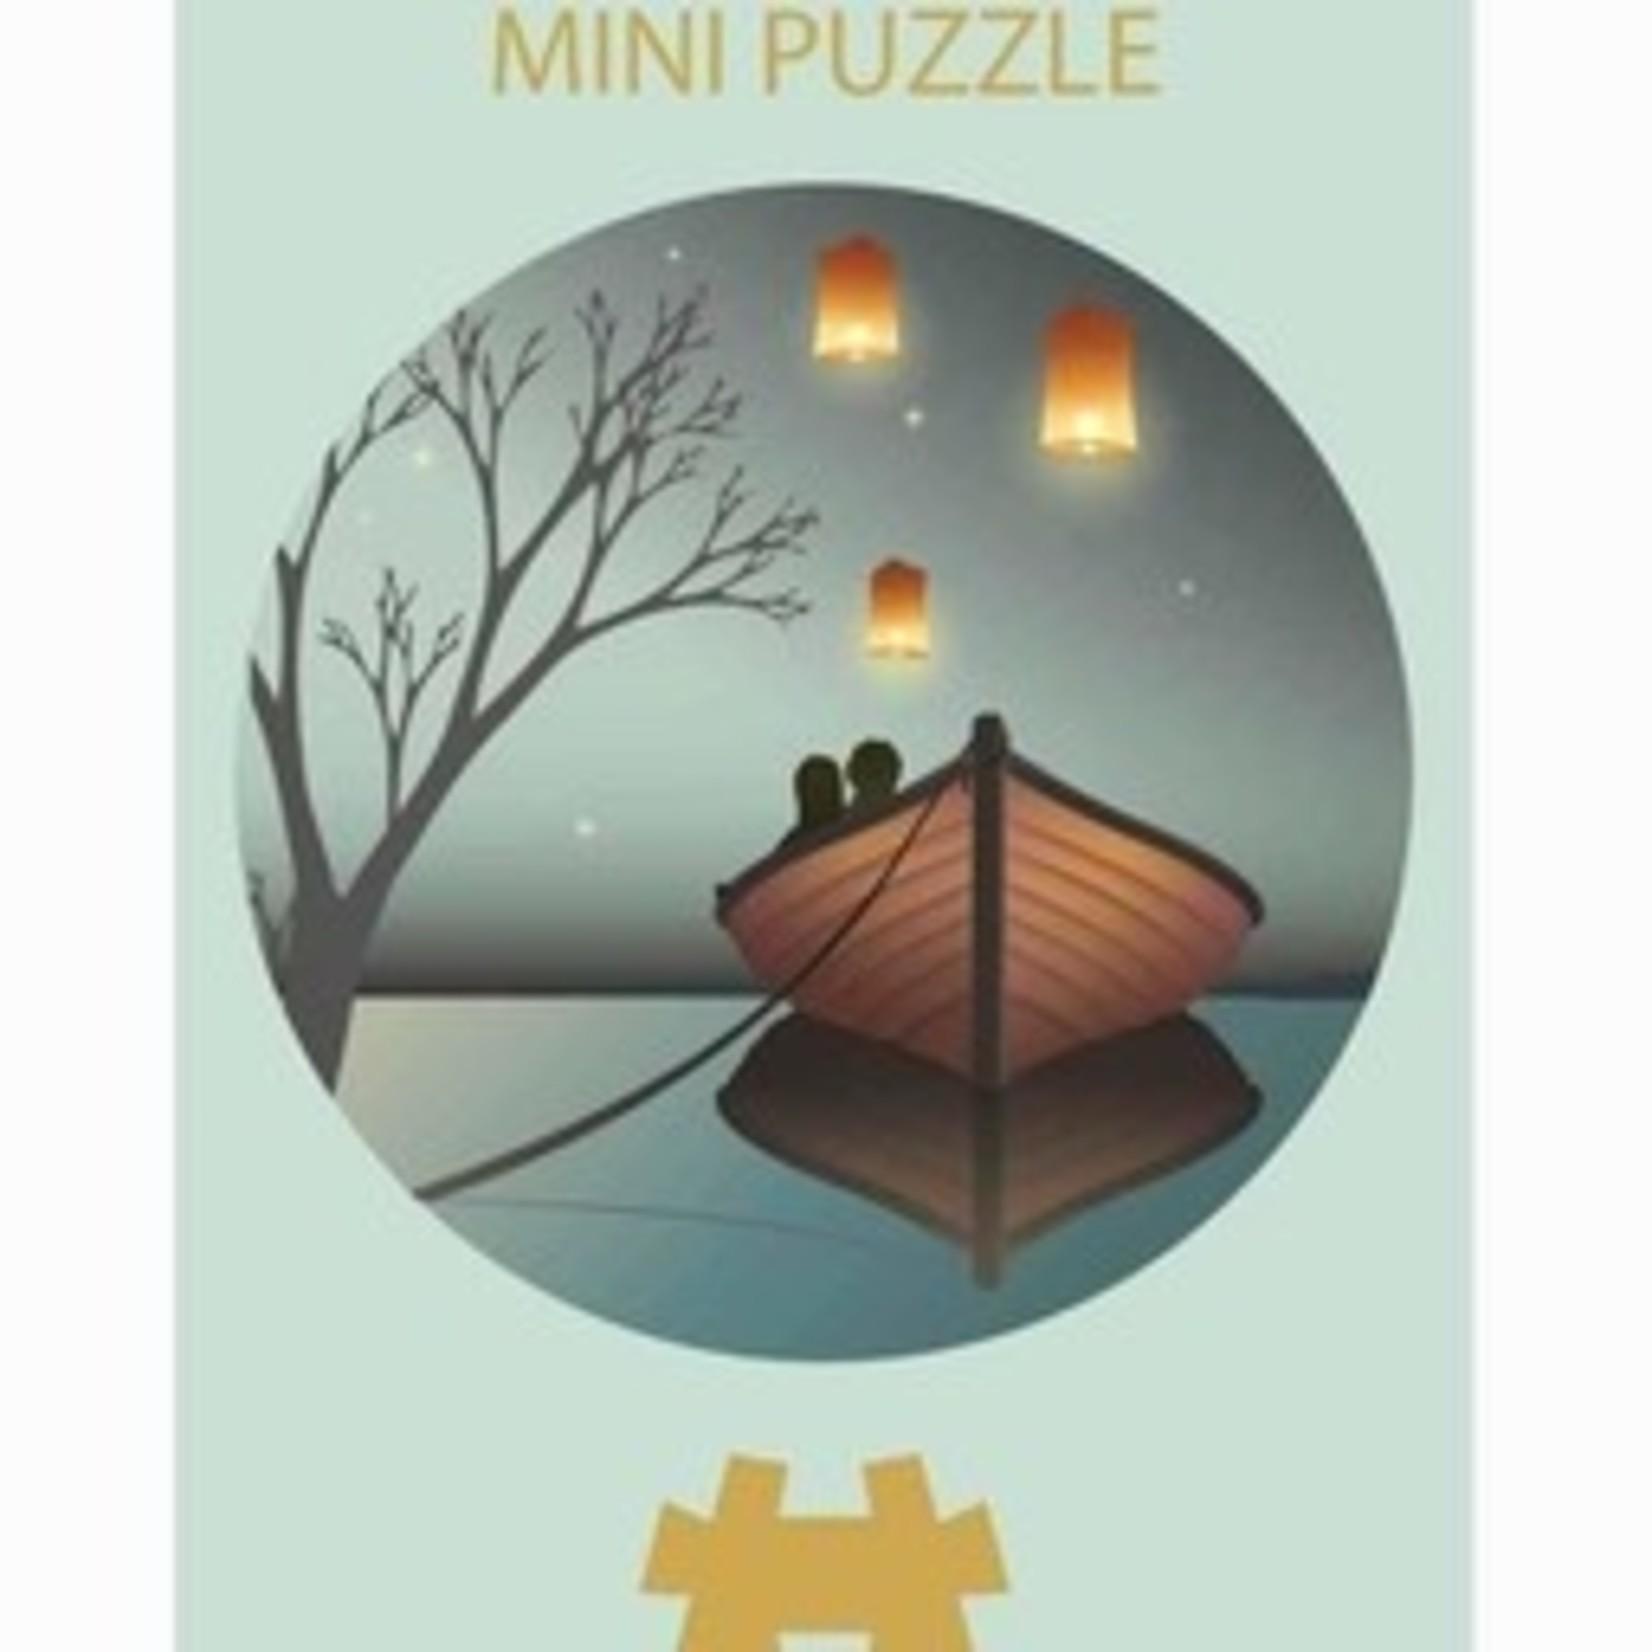 Vissevasse Puzzel - Mini - 3 varianten